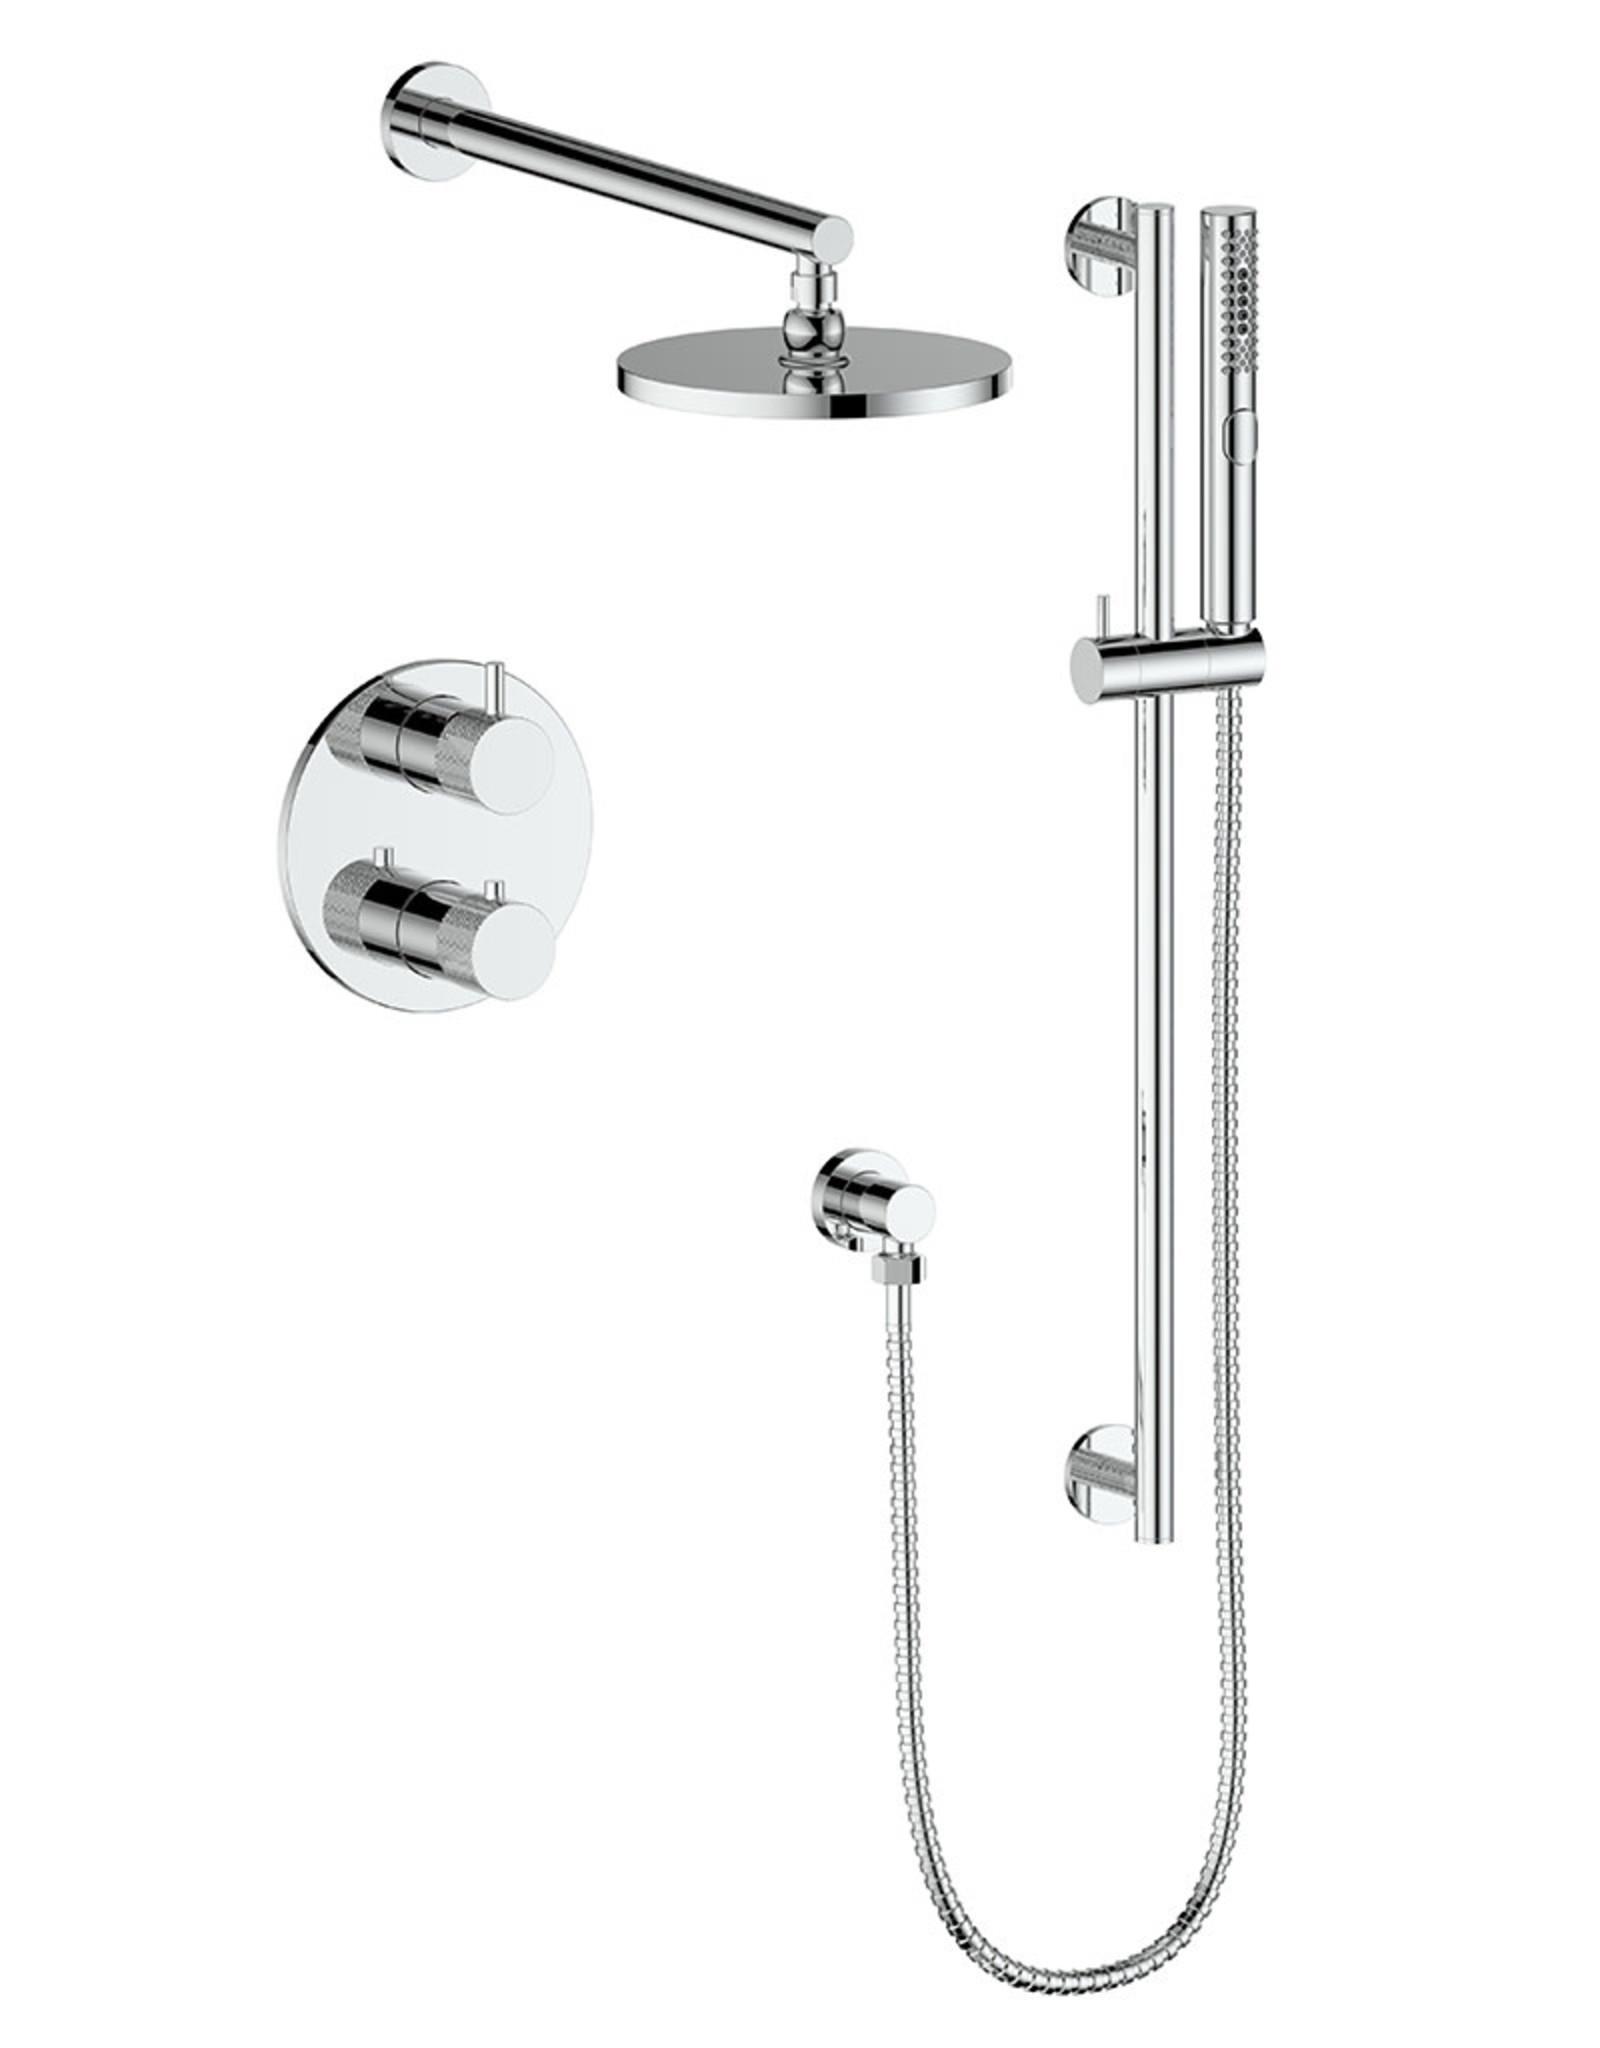 Vogt Drava 2-Way Thermostatic Shower System- Handheld With Rainhead- Chrome